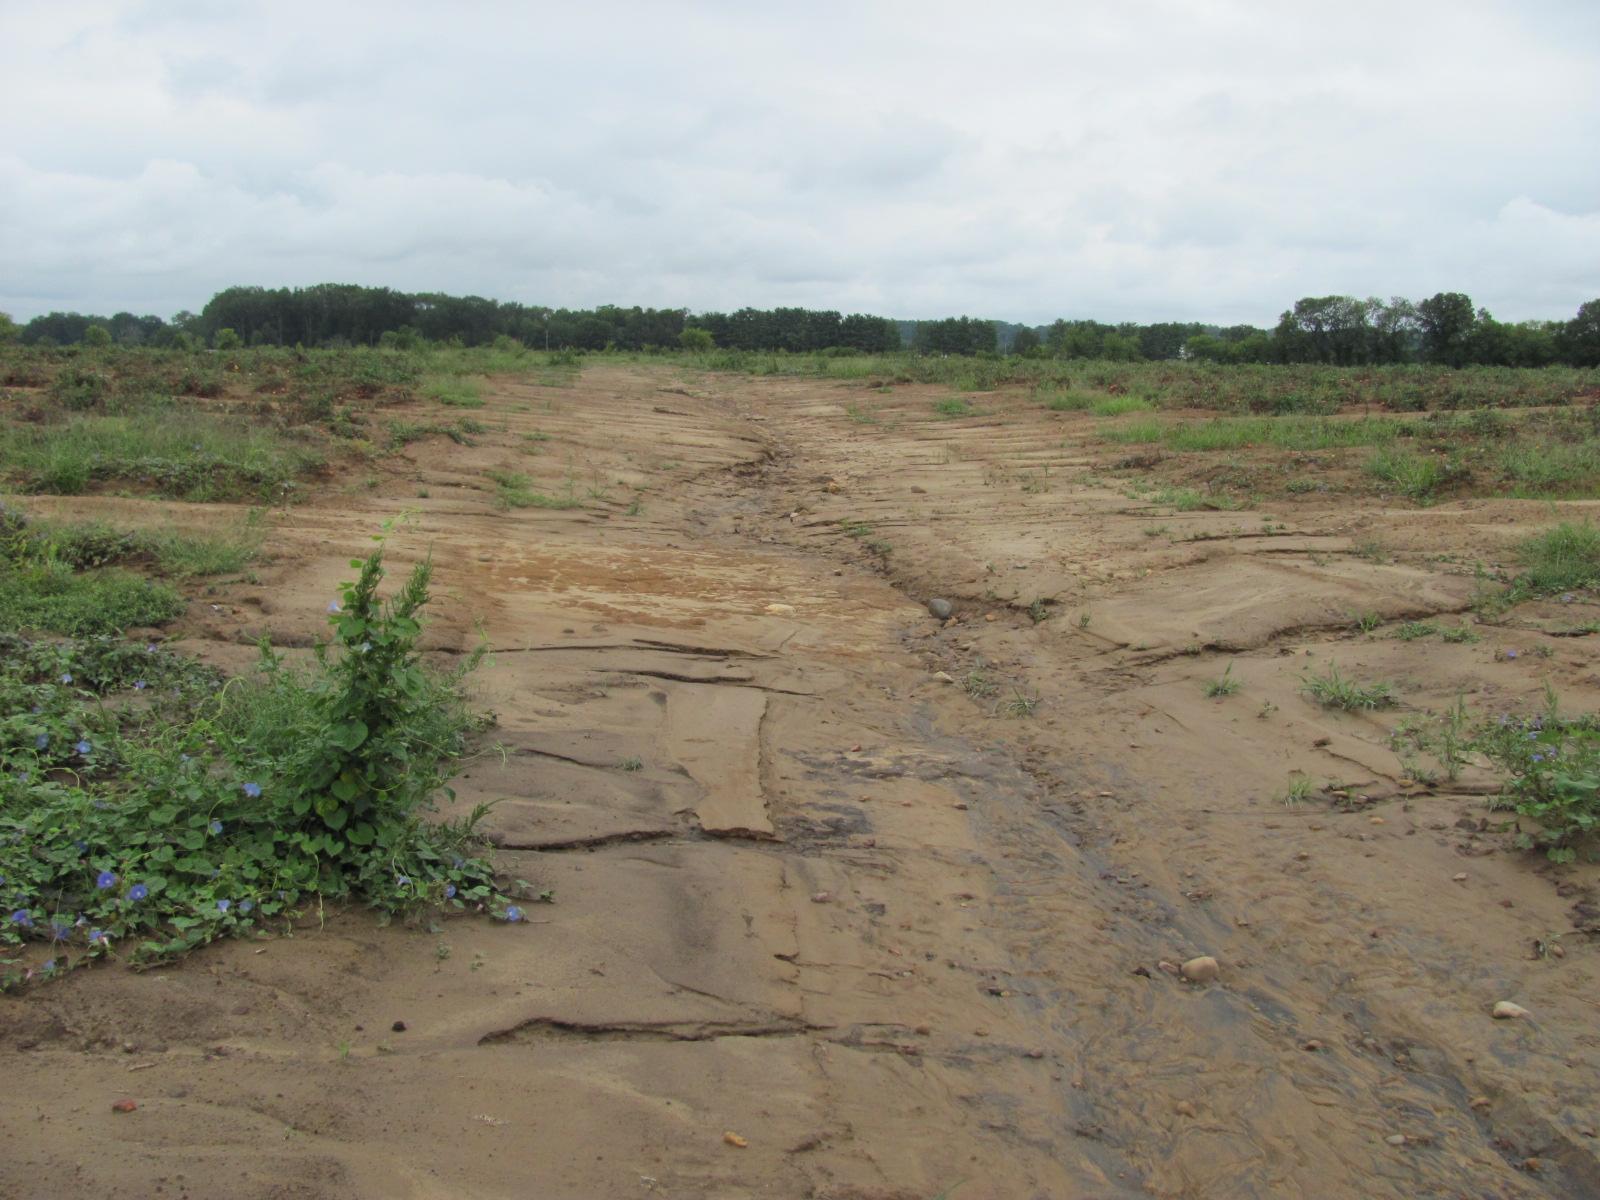 Shelton Farms, Hamblen County, TN. Erosion Prior to Project Implementation